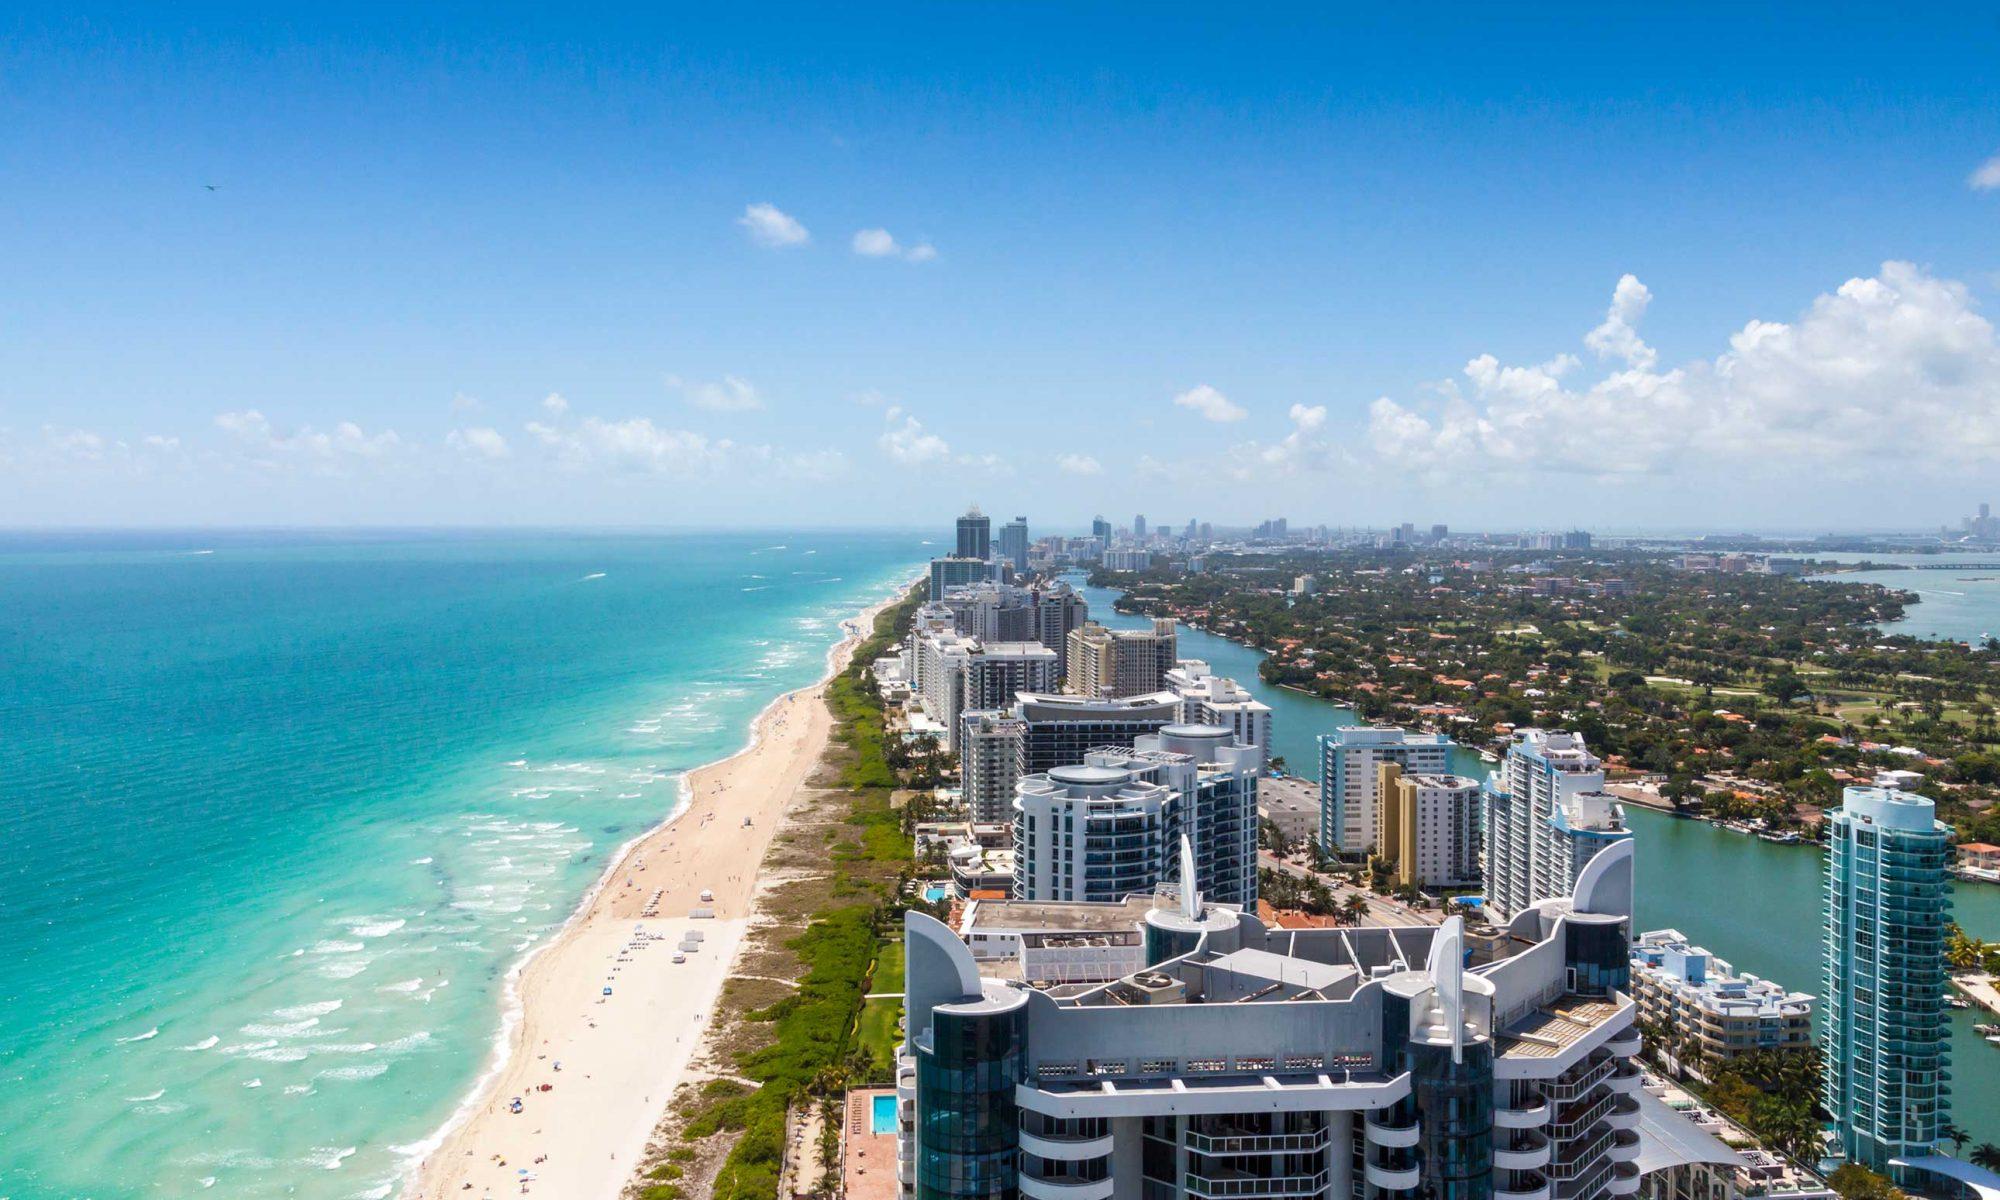 MiamiFlorida.se